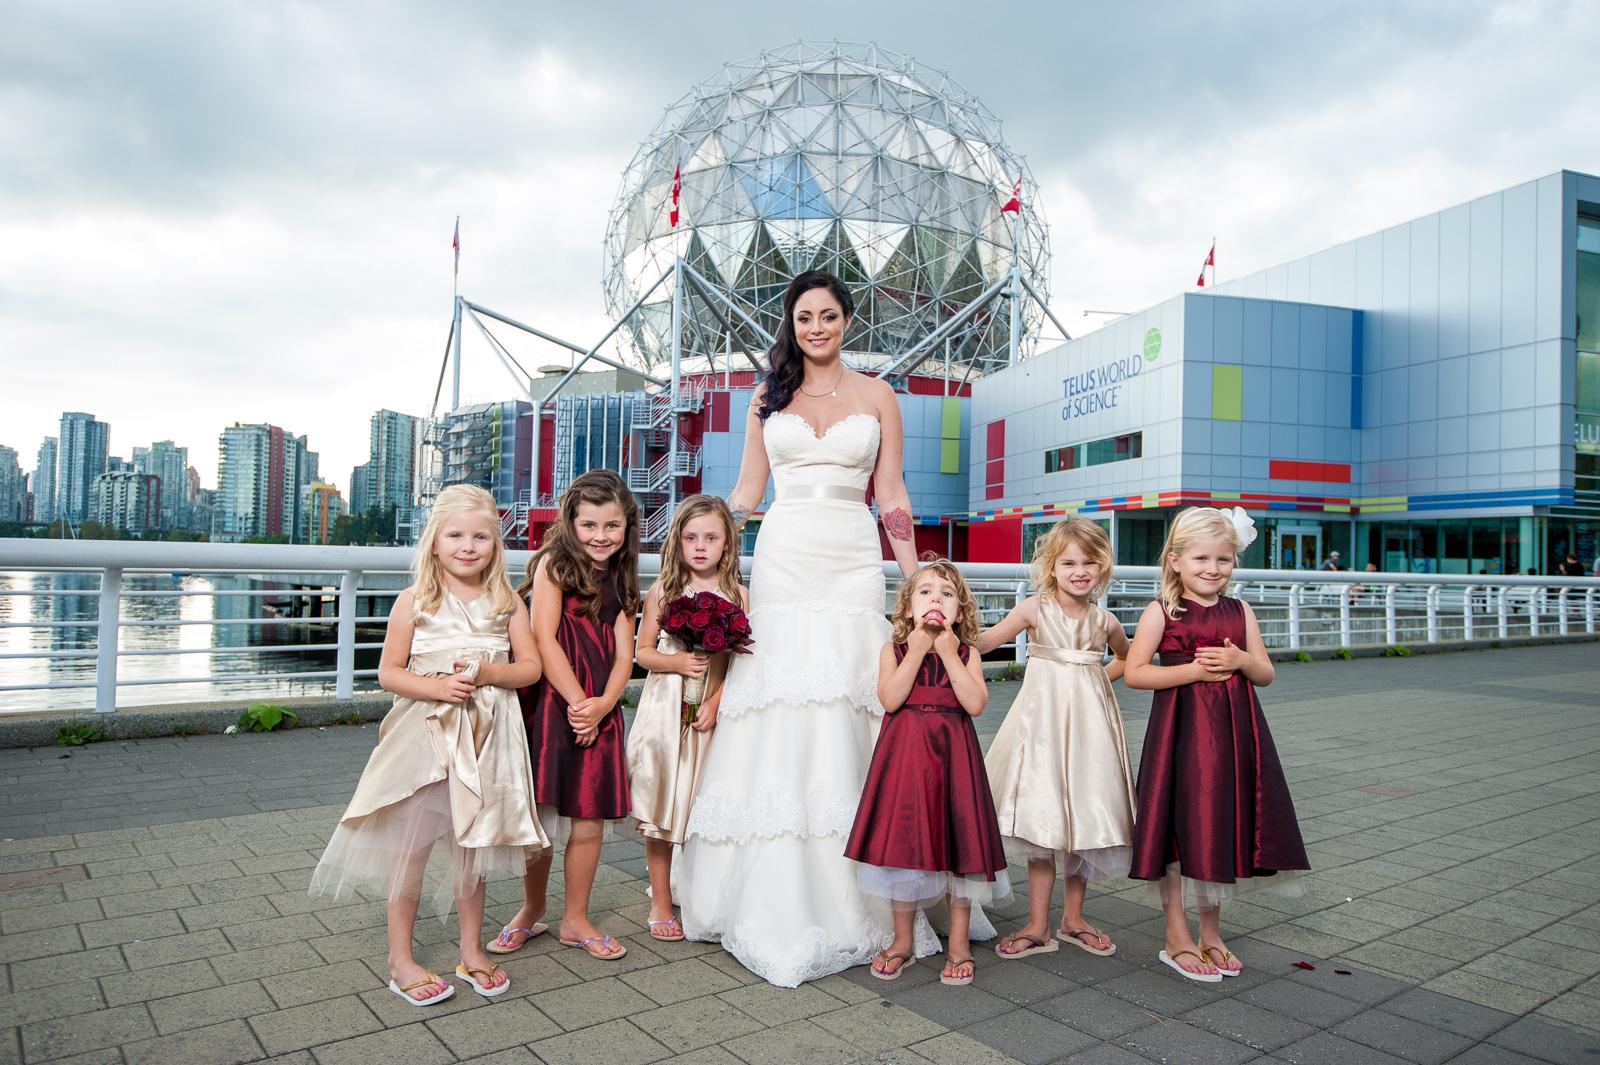 victoria-wedding-photographers-science-world-wedding-telus-world-of-science-wedding-32.jpg